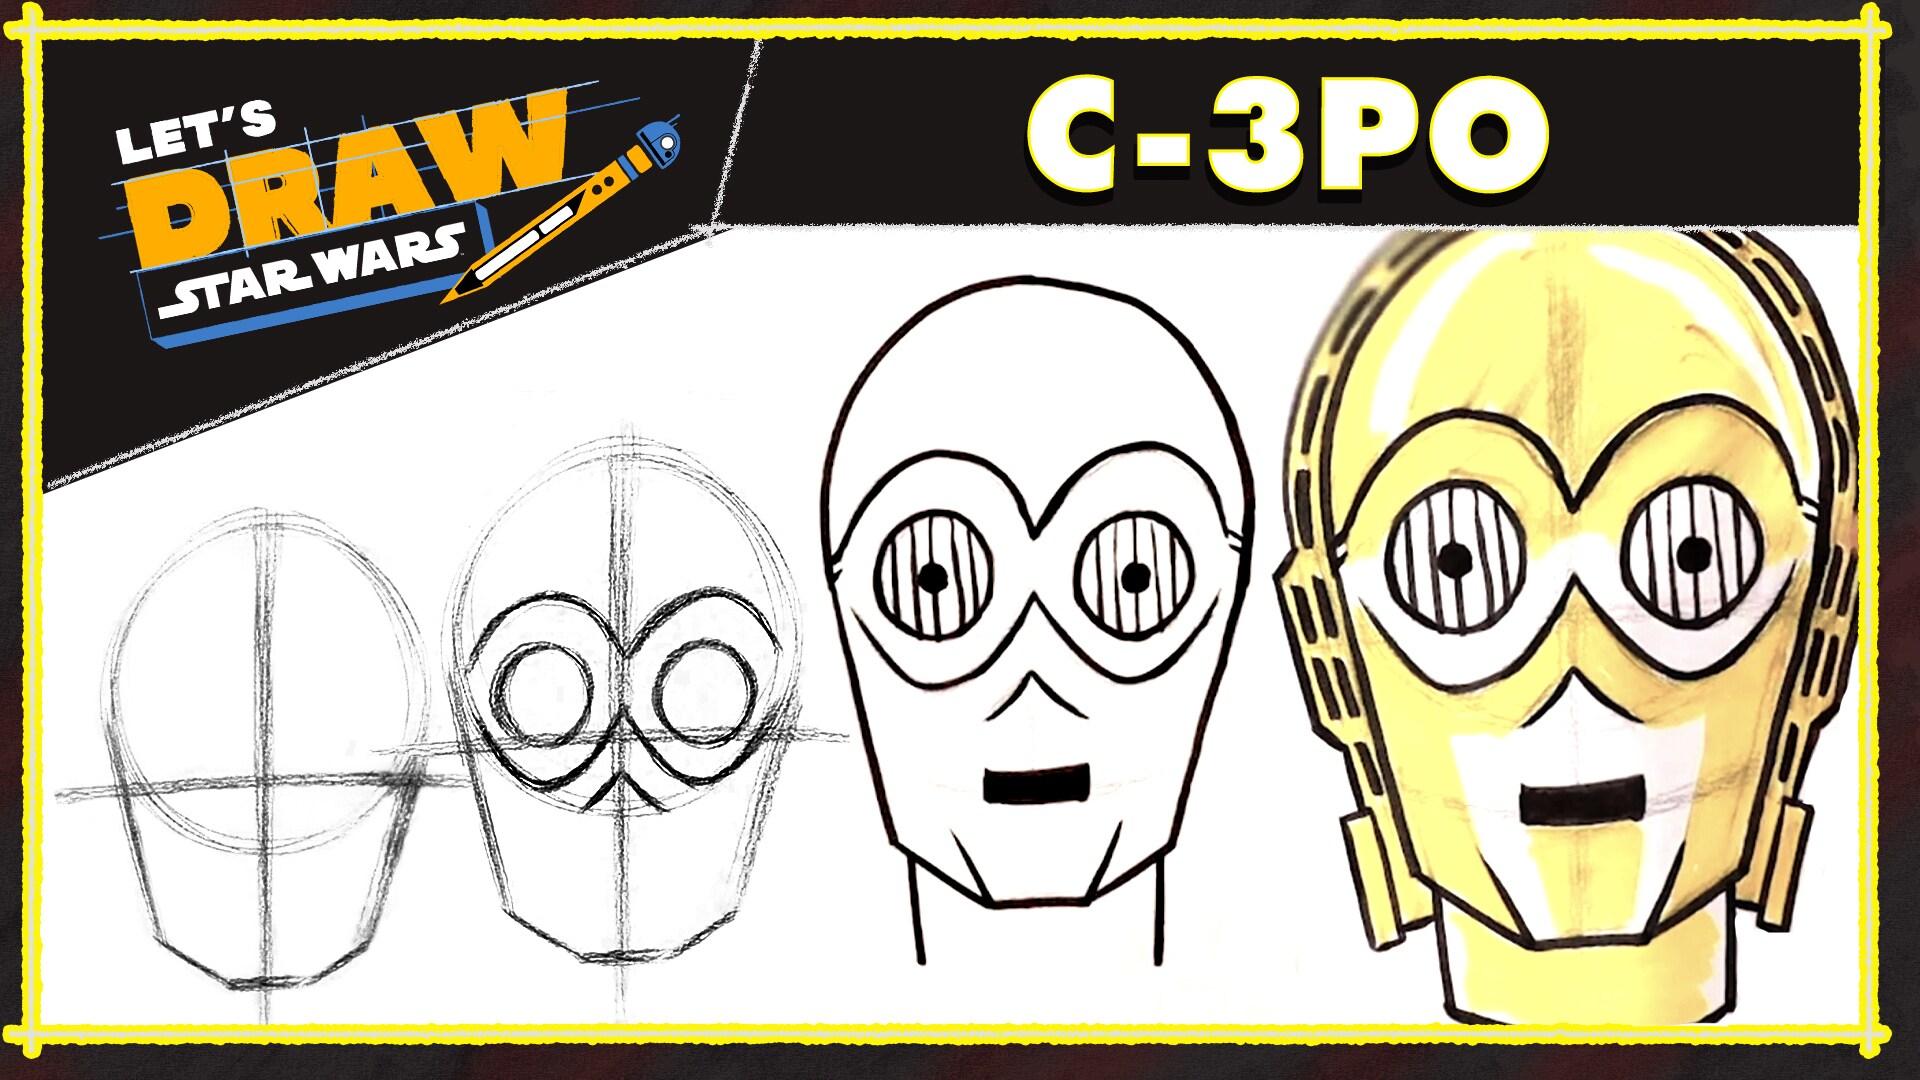 Let's Draw! C-3PO